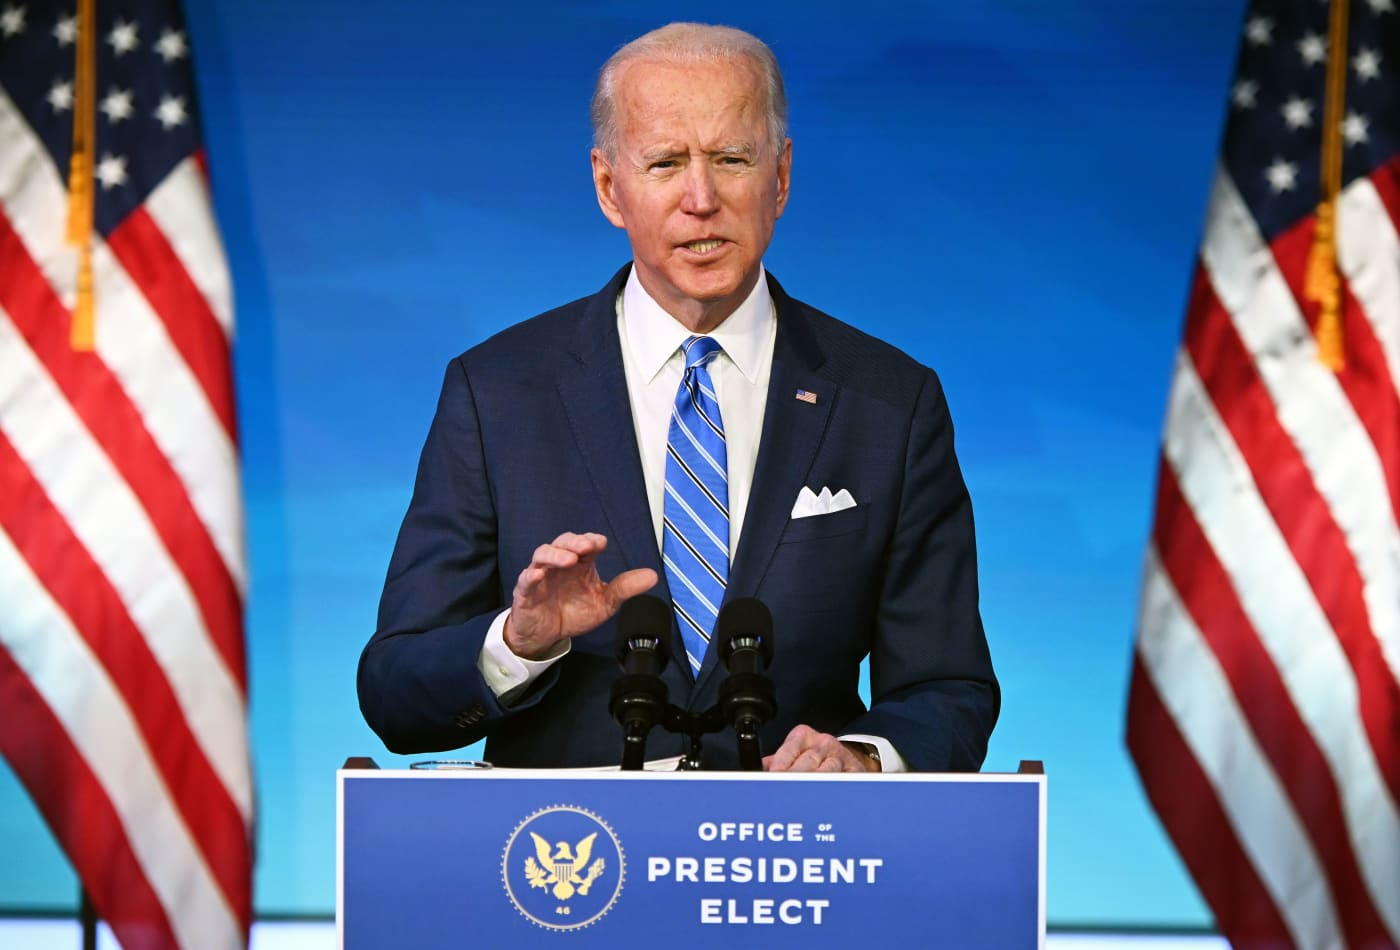 Biden's $1.9 trillion Covid relief plan calls for stimulus checks, unemployment support and more